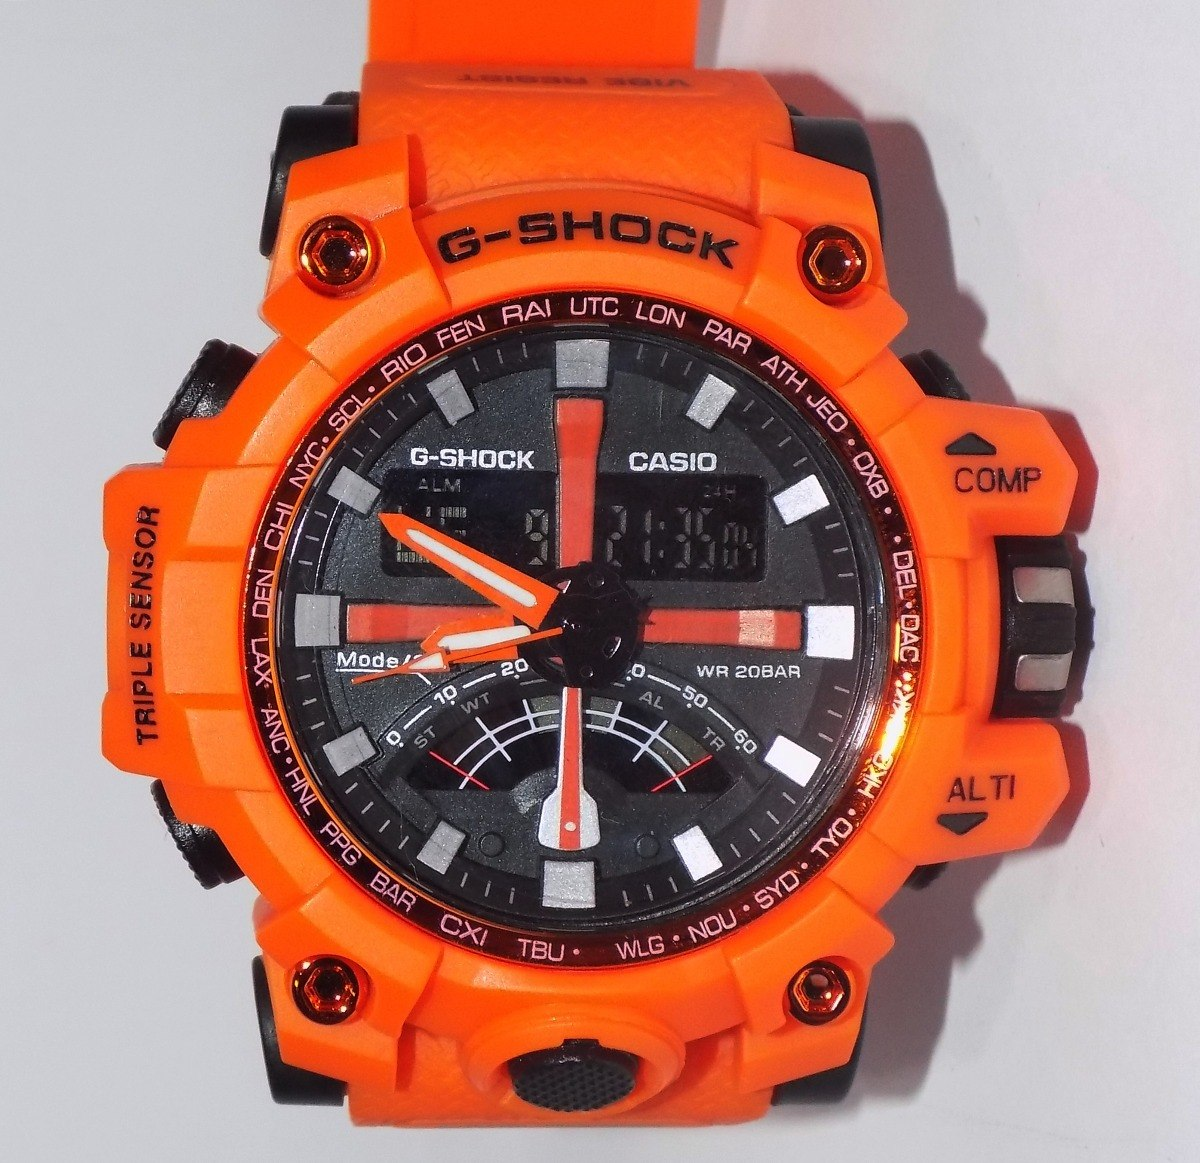 7fa3f4edc46 relógio g shock barato analógico digital masculino importado. Carregando  zoom.